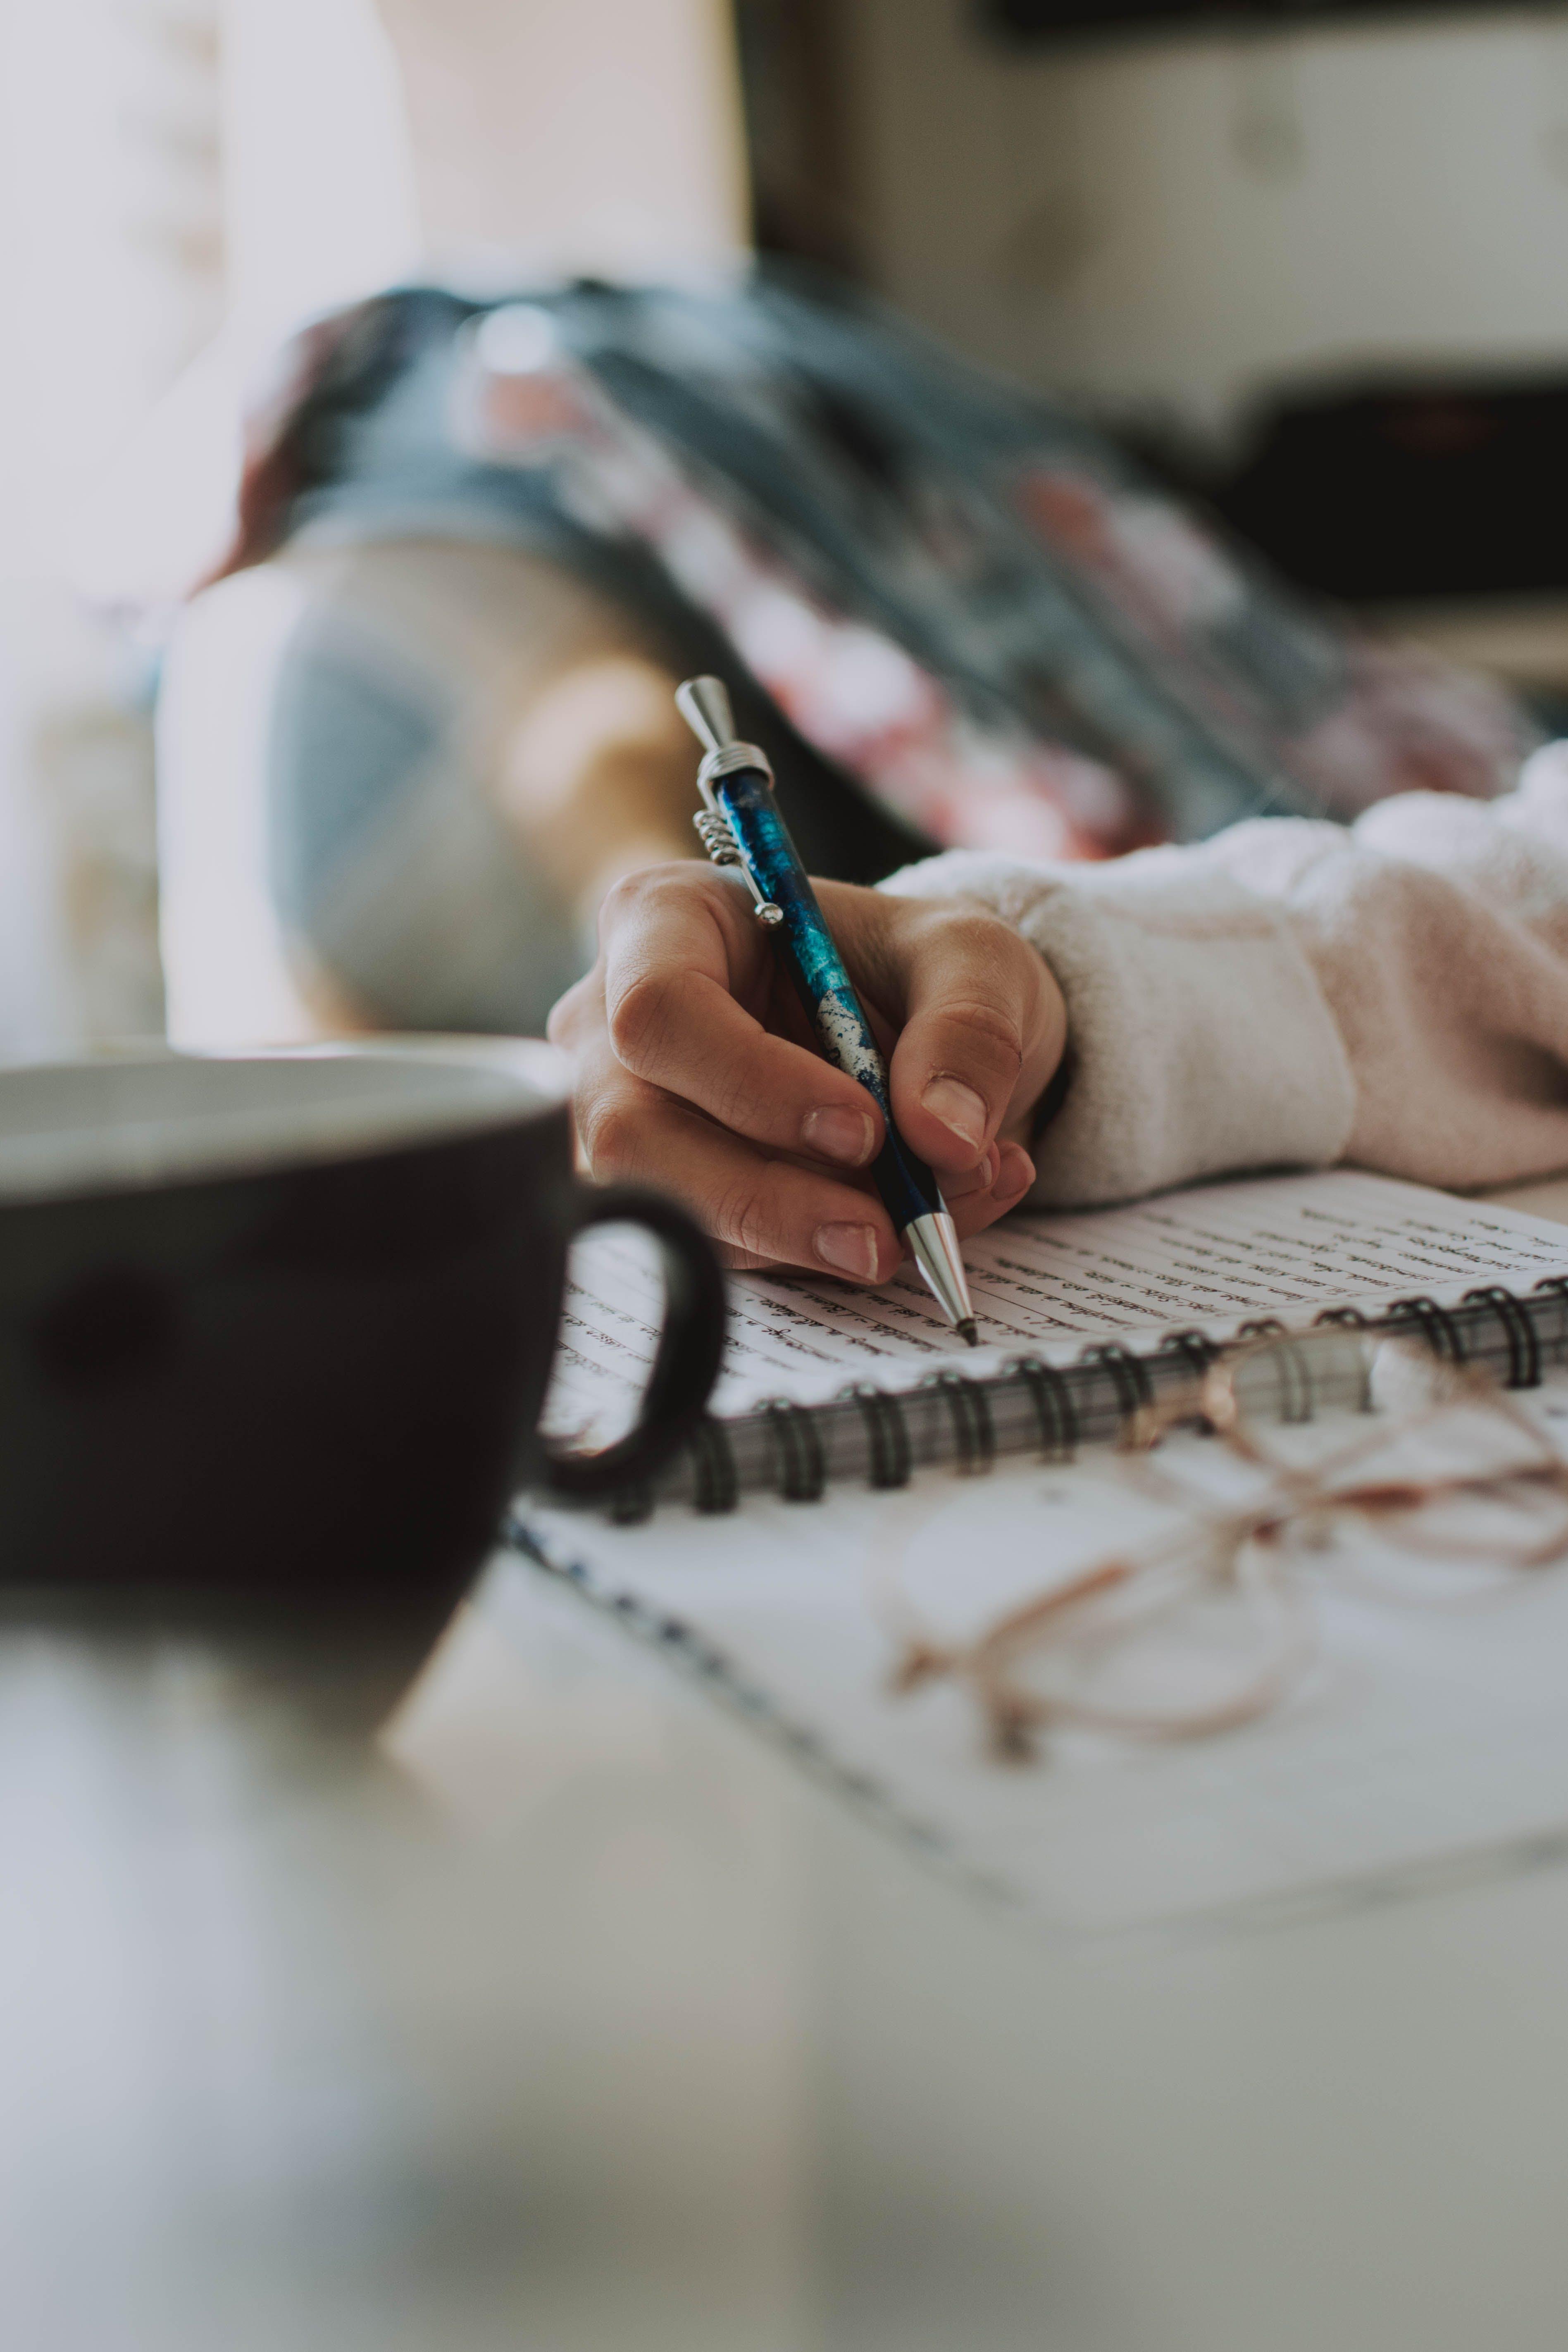 anteckningsbok, ha på sig, hand